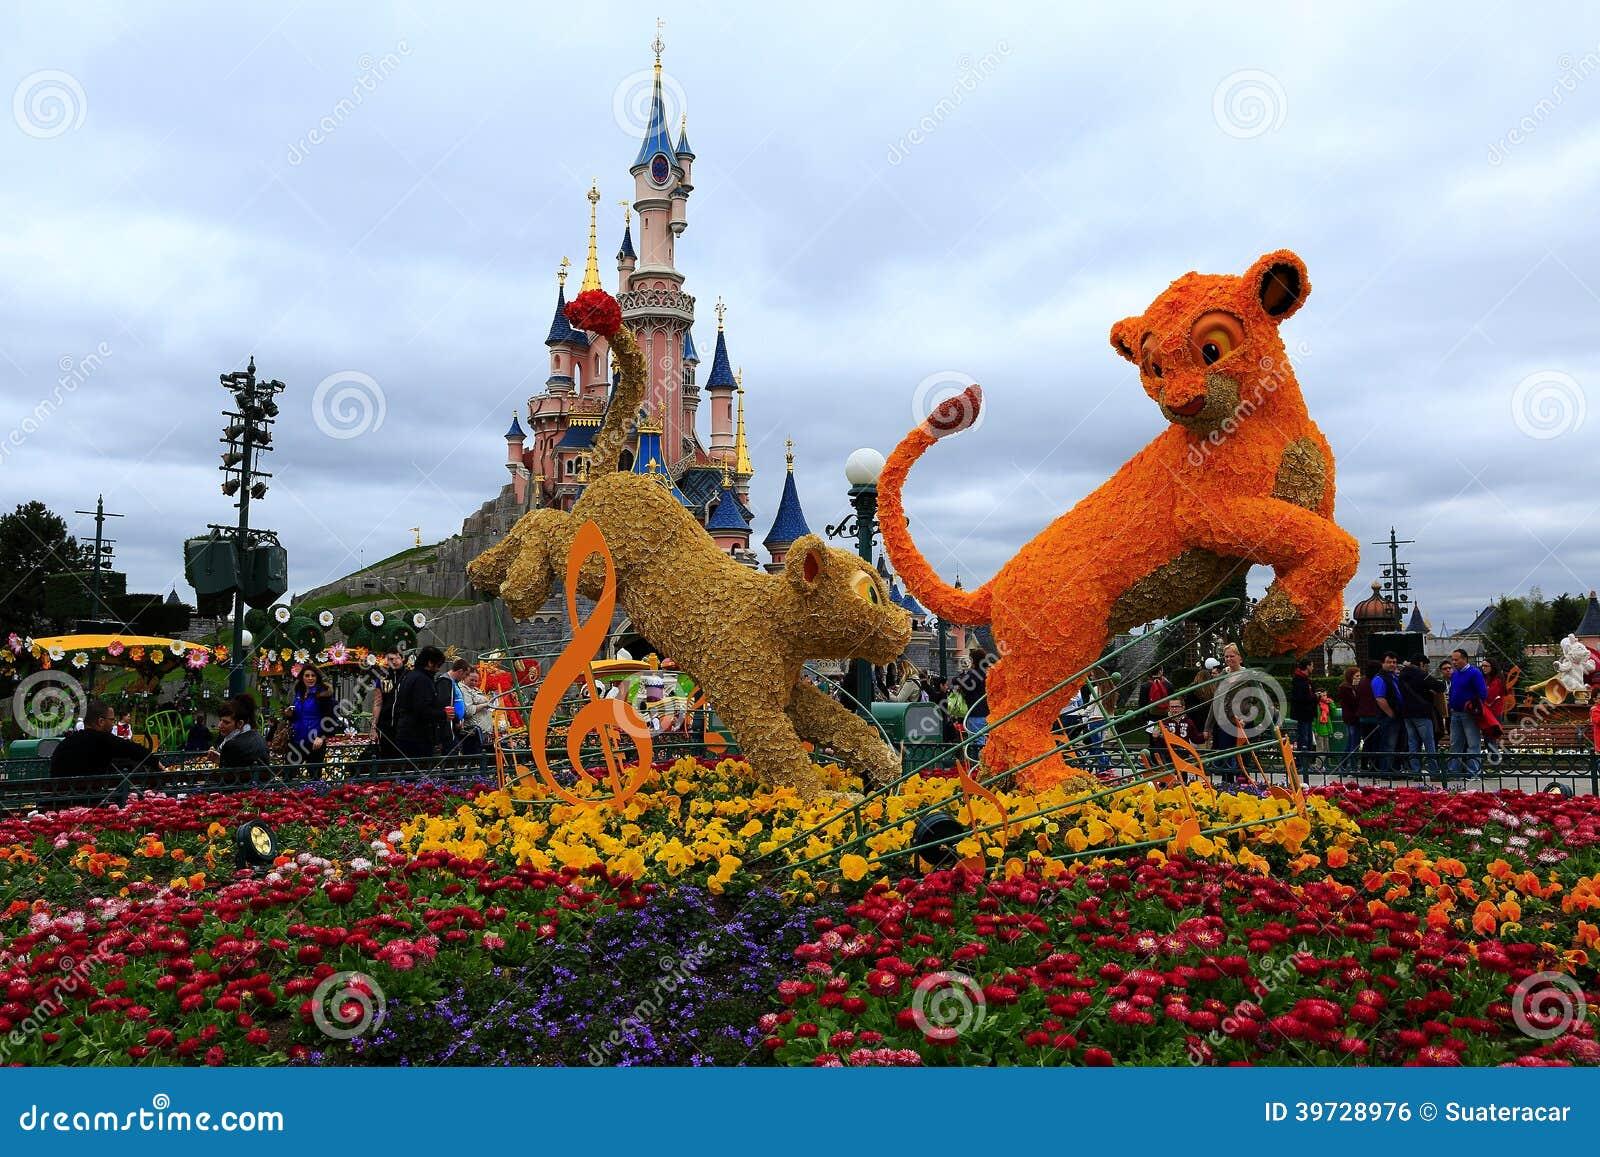 Disneyland paris photo ditorial image 39728976 for Jardines en primavera fotos